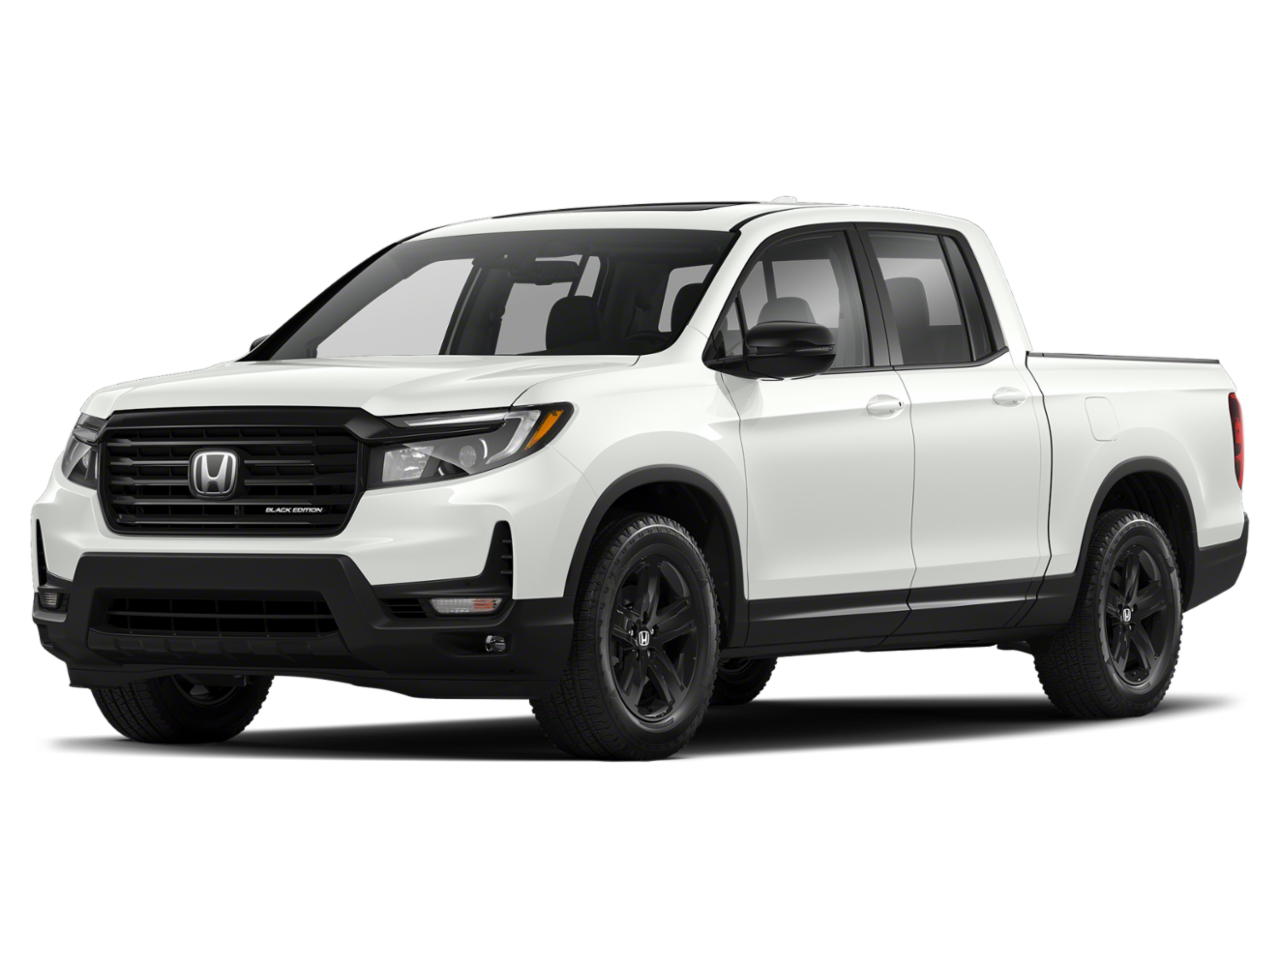 Honda 2021 Ridgeline Black Edition